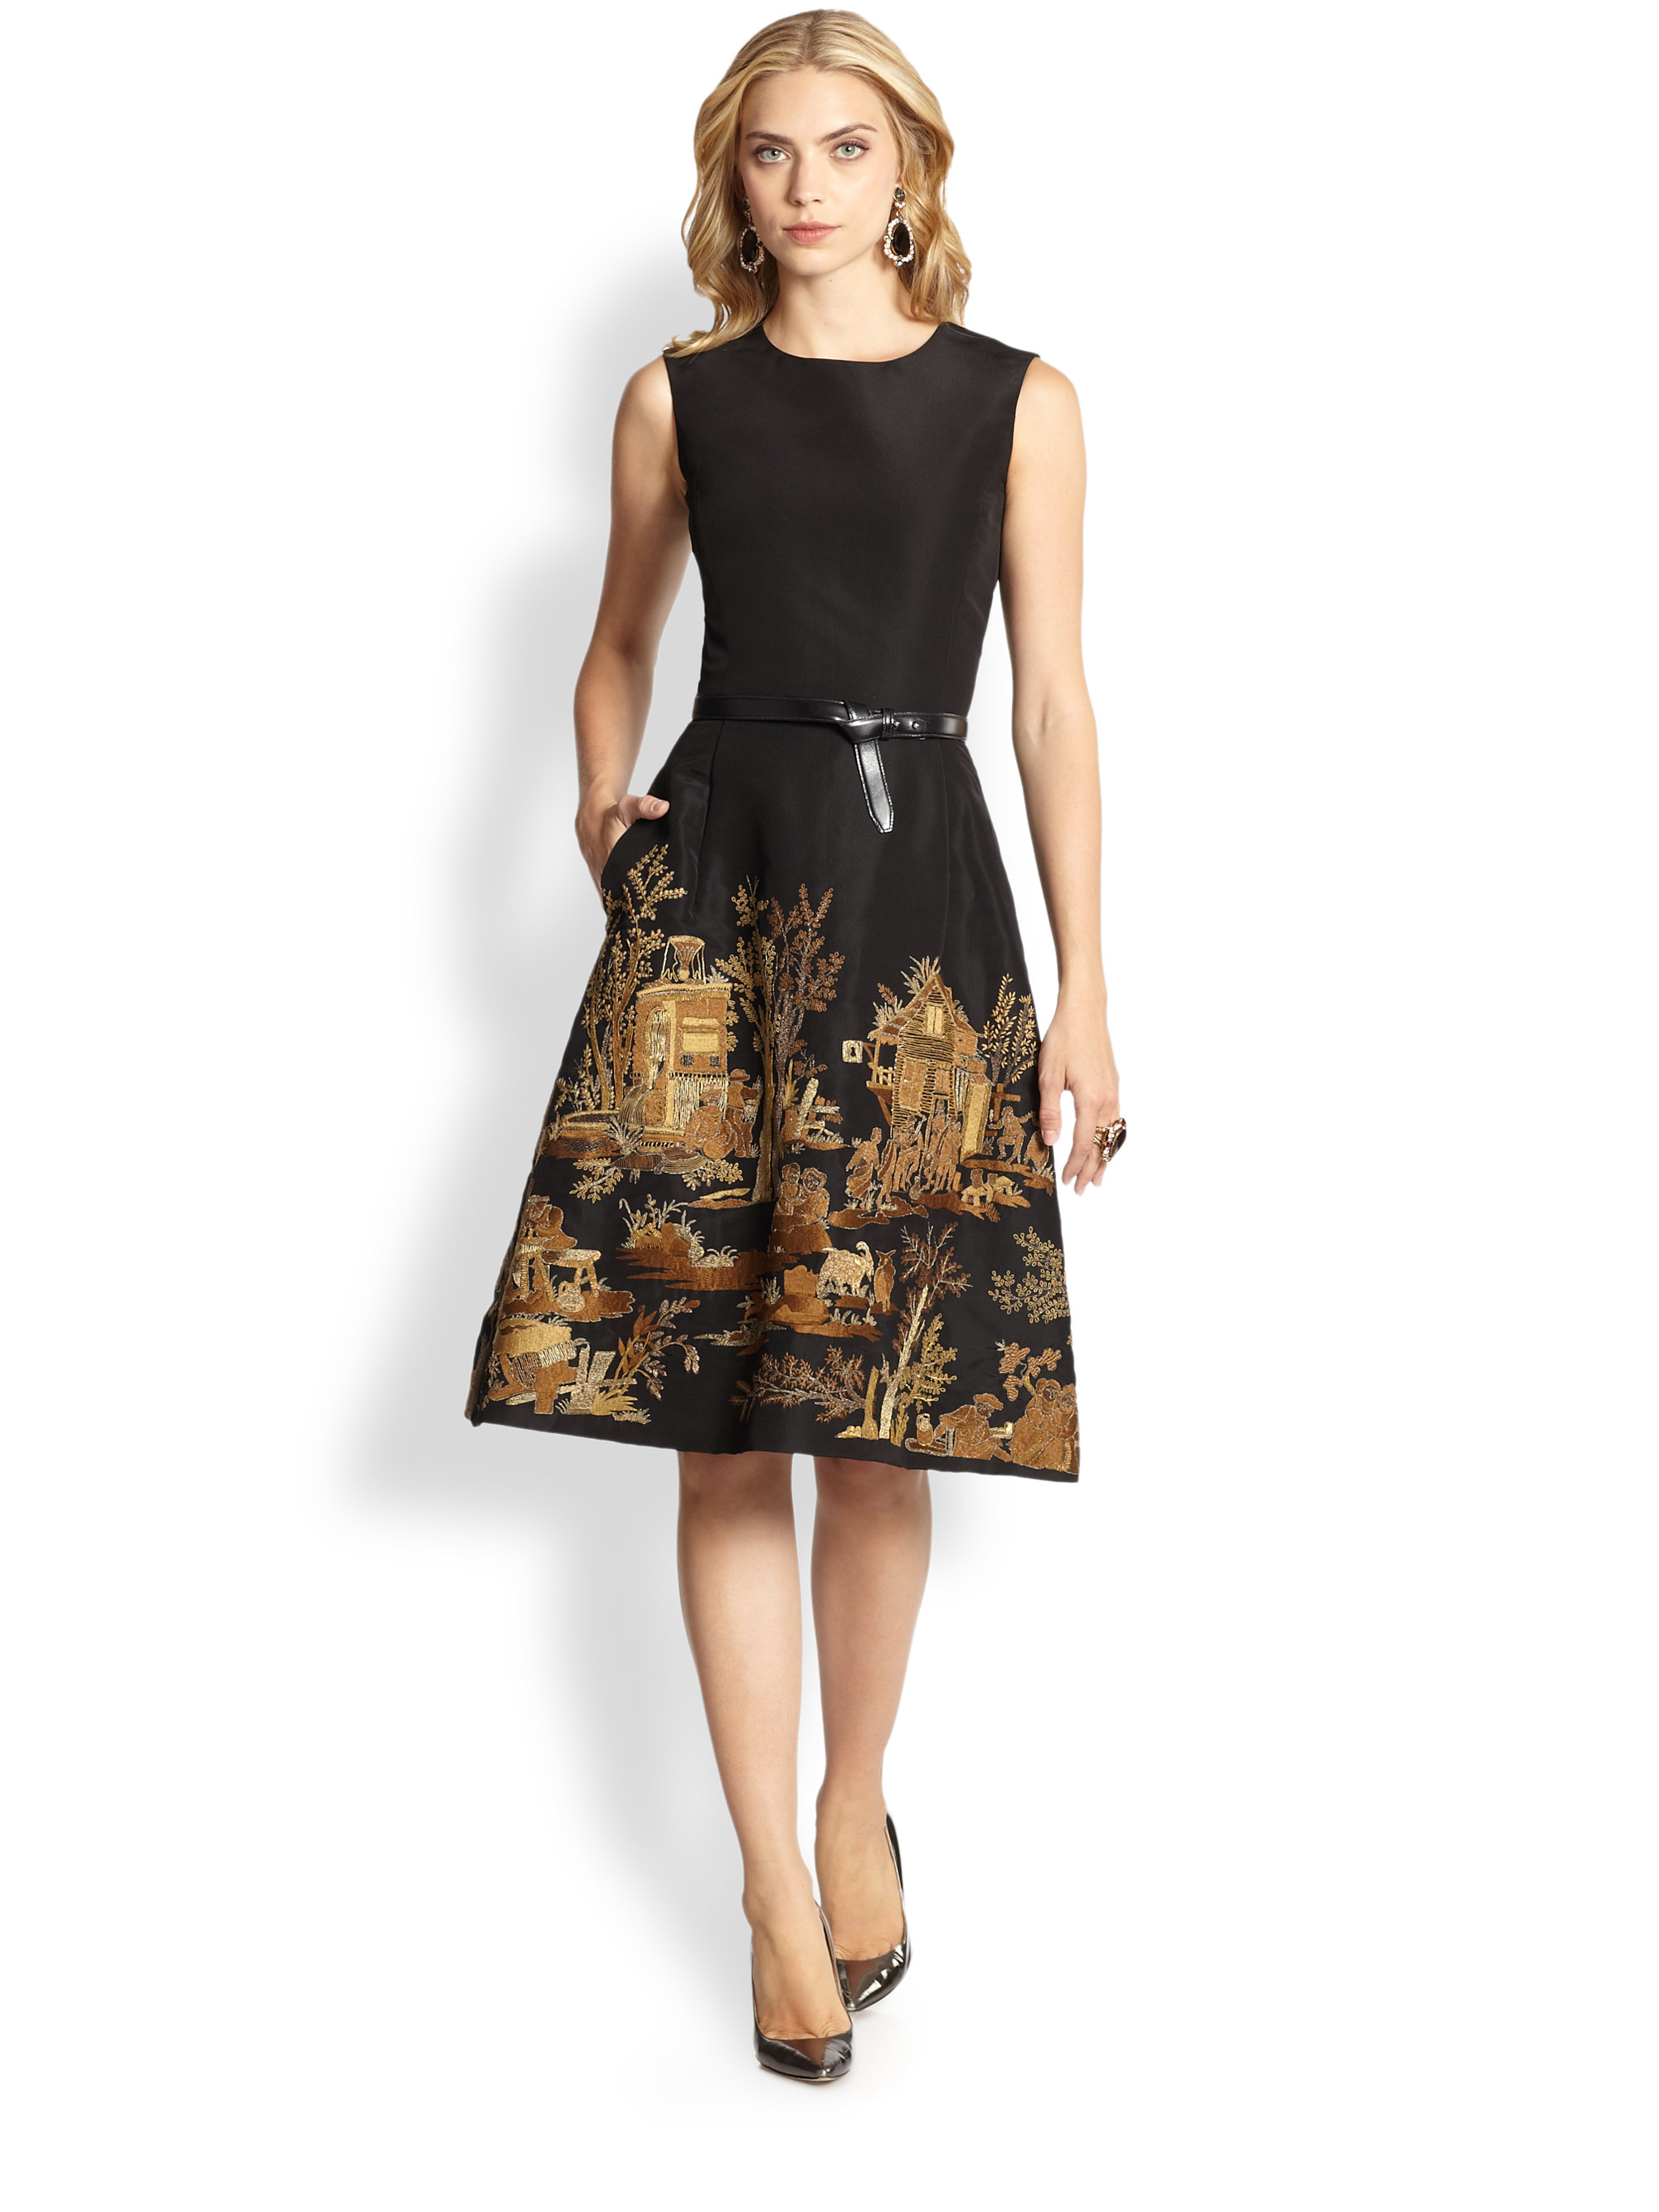 Lyst Oscar De La Renta Embroidered Cocktail Dress In Black